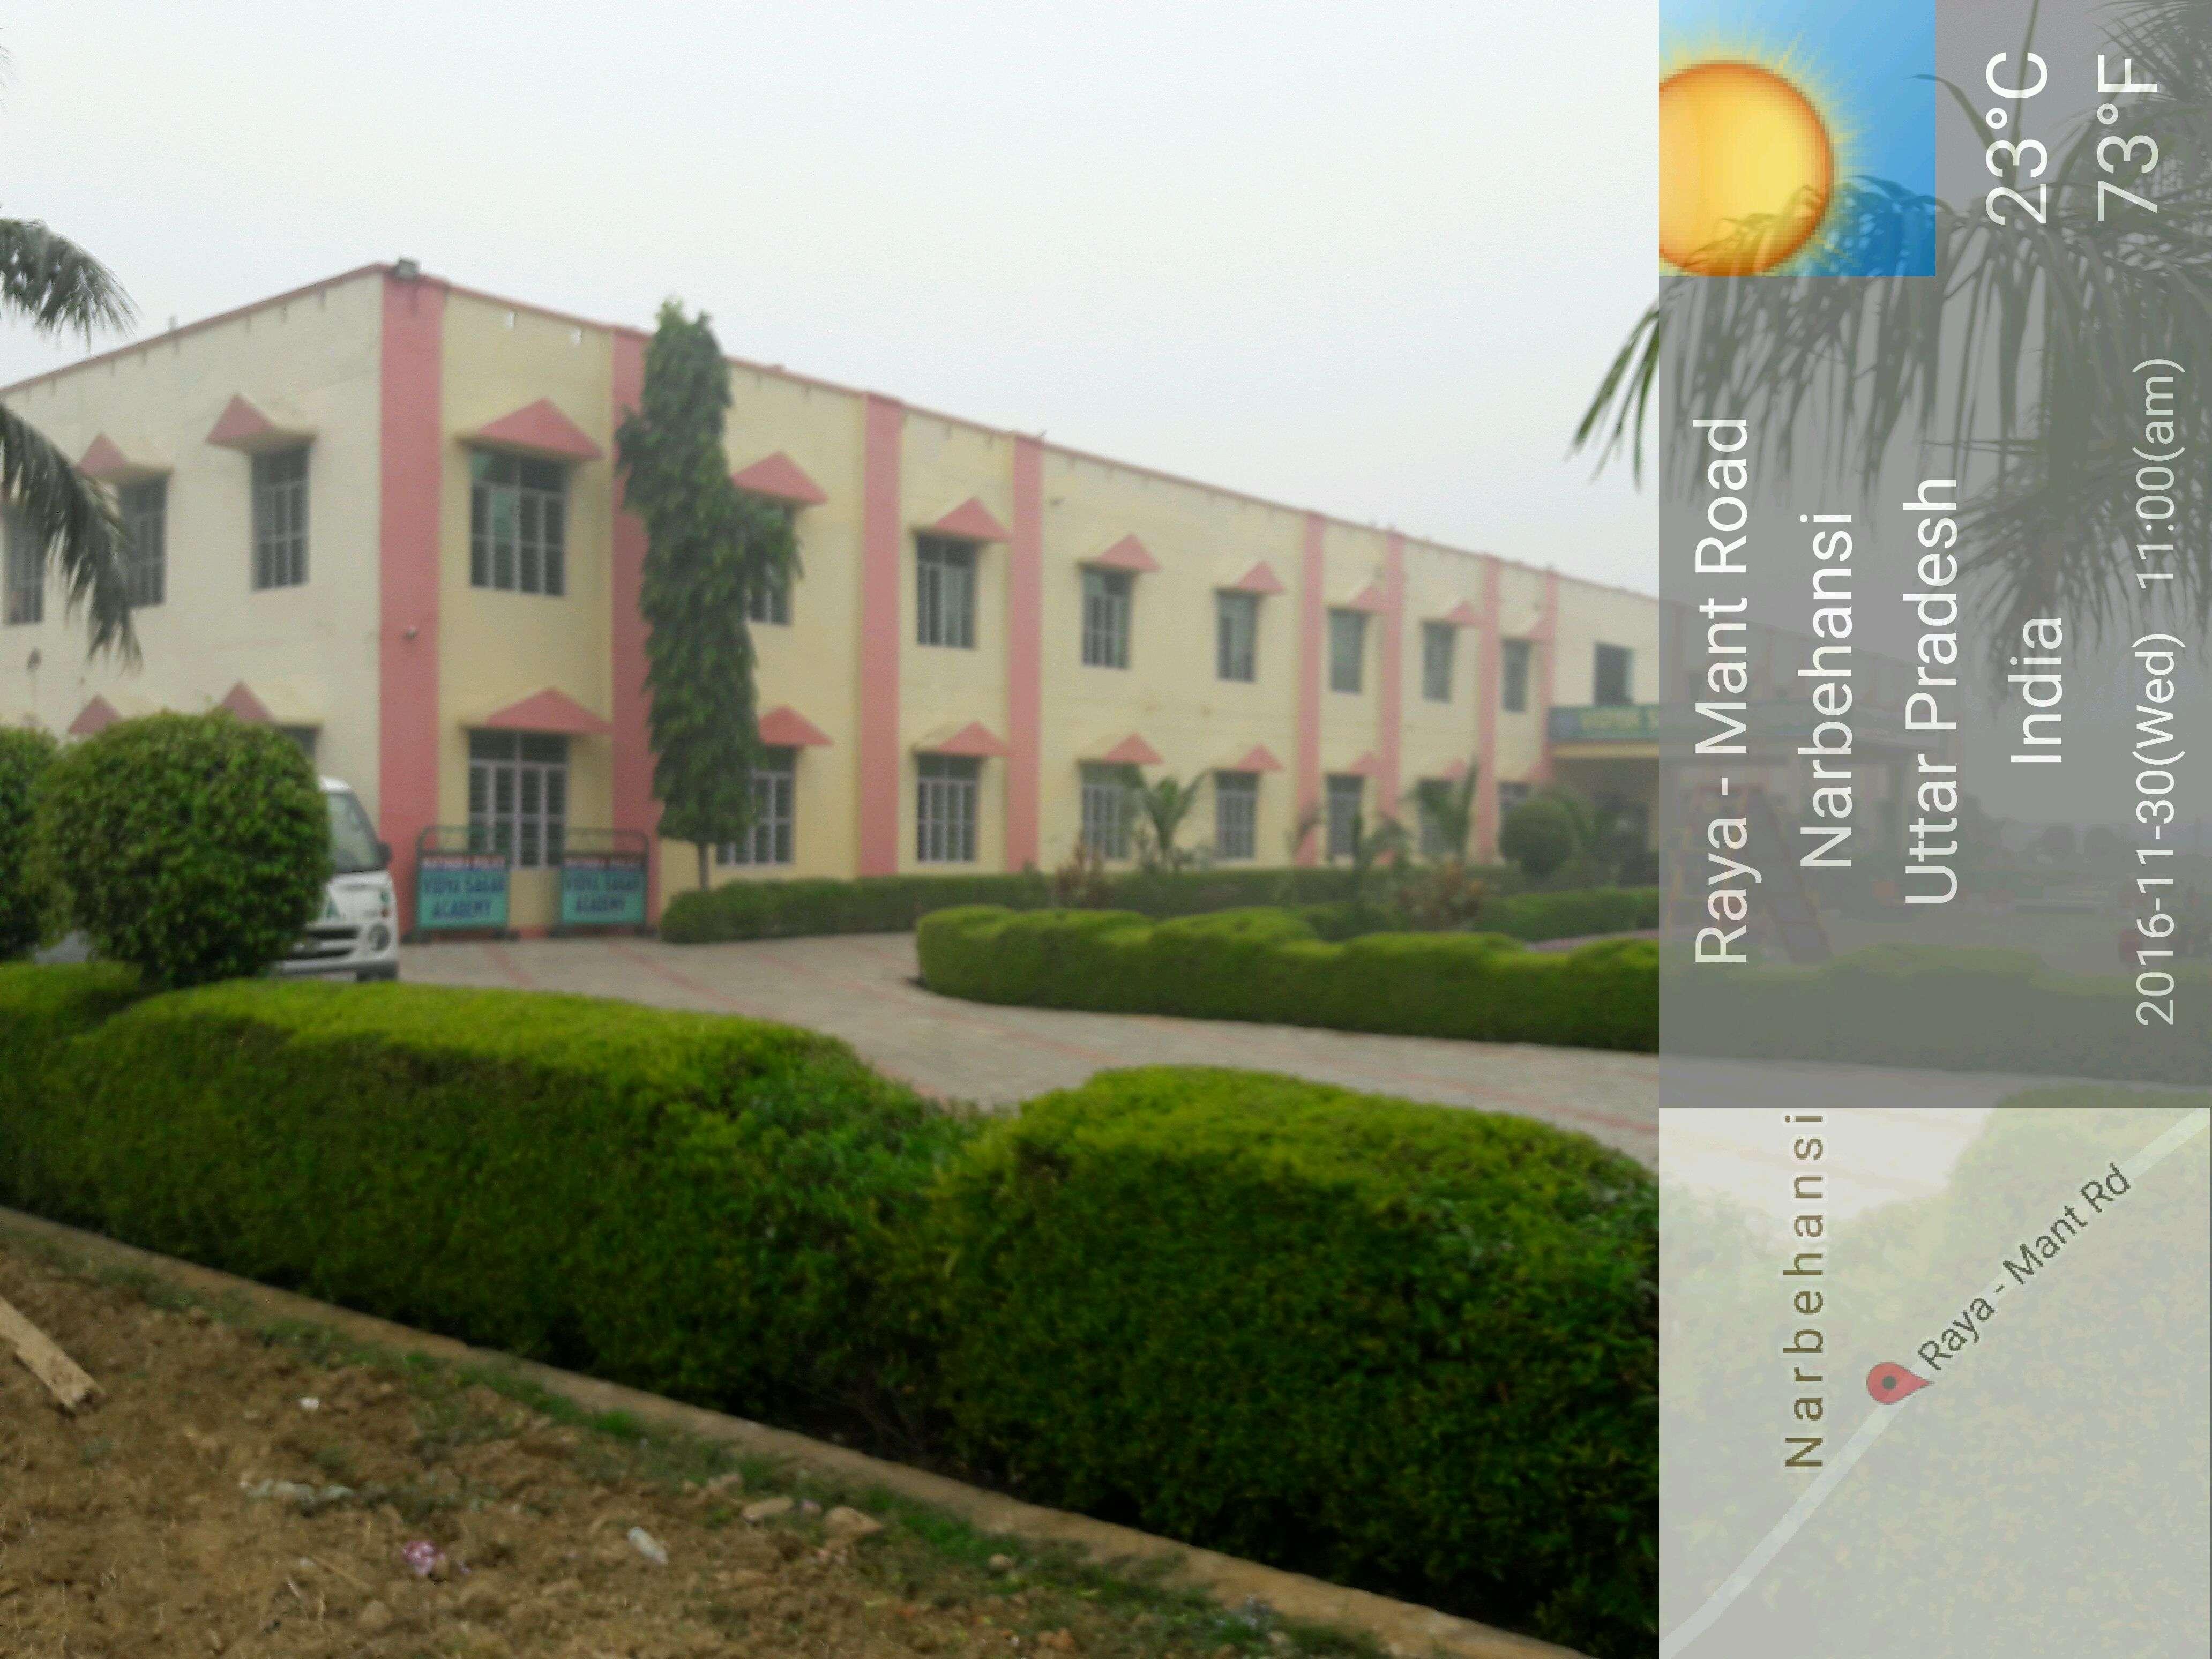 Vidya Sagar Academy Mant Road Raya Mathura 2131140